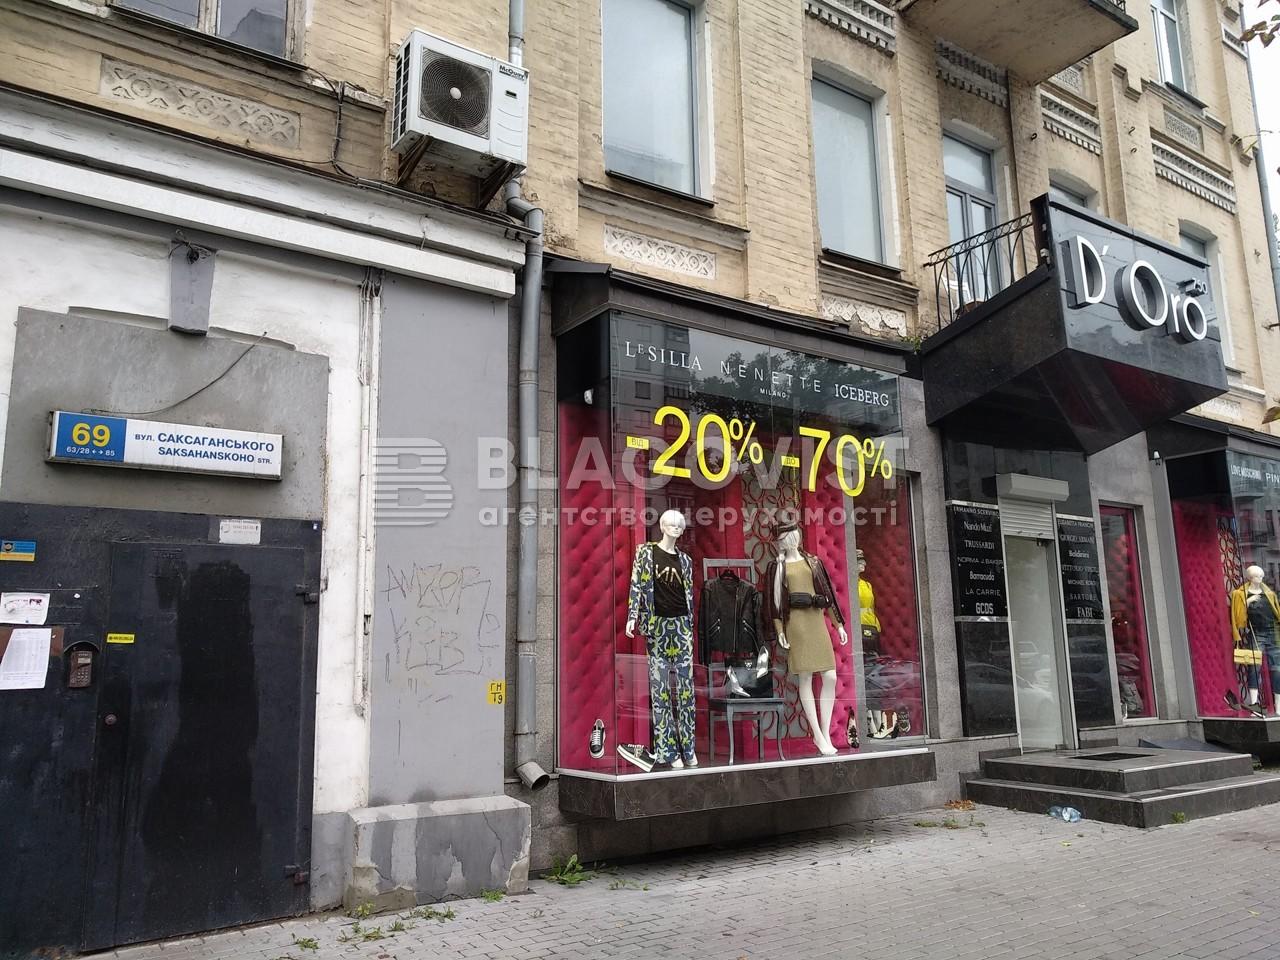 Квартира P-28706, Саксаганского, 69, Киев - Фото 9